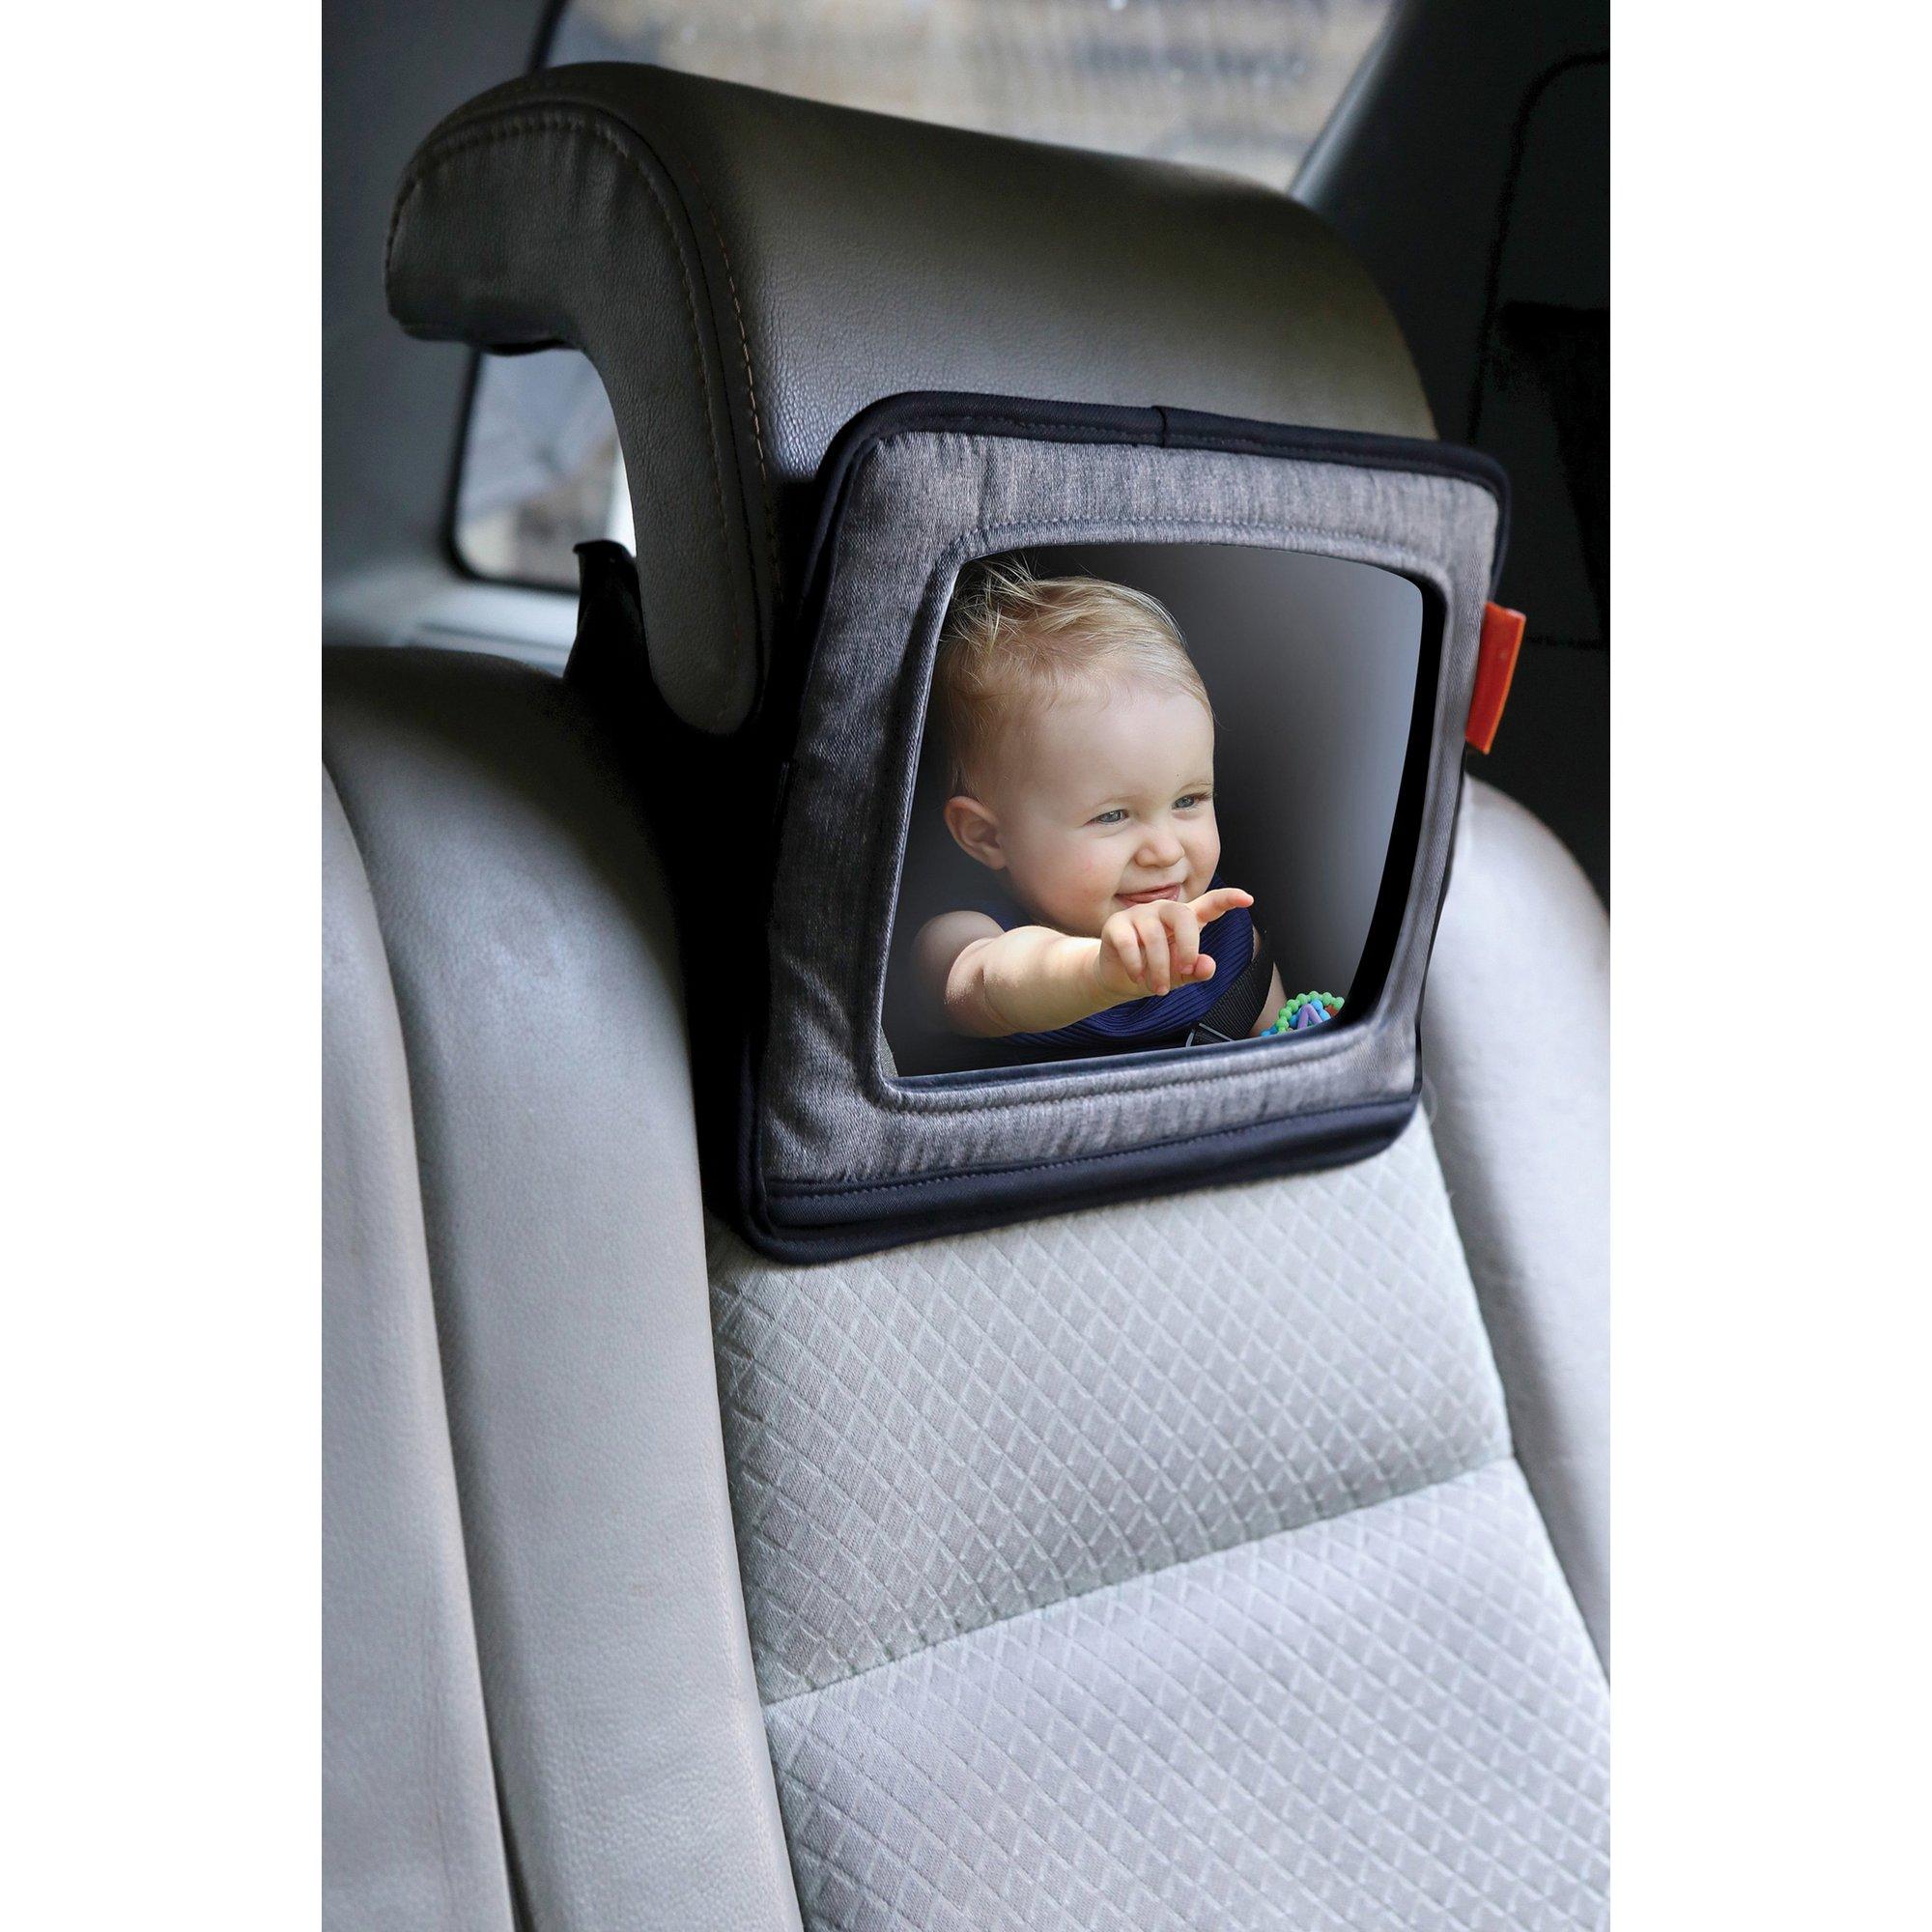 Image of Backseat Mirror with Ipad Holder – Grey